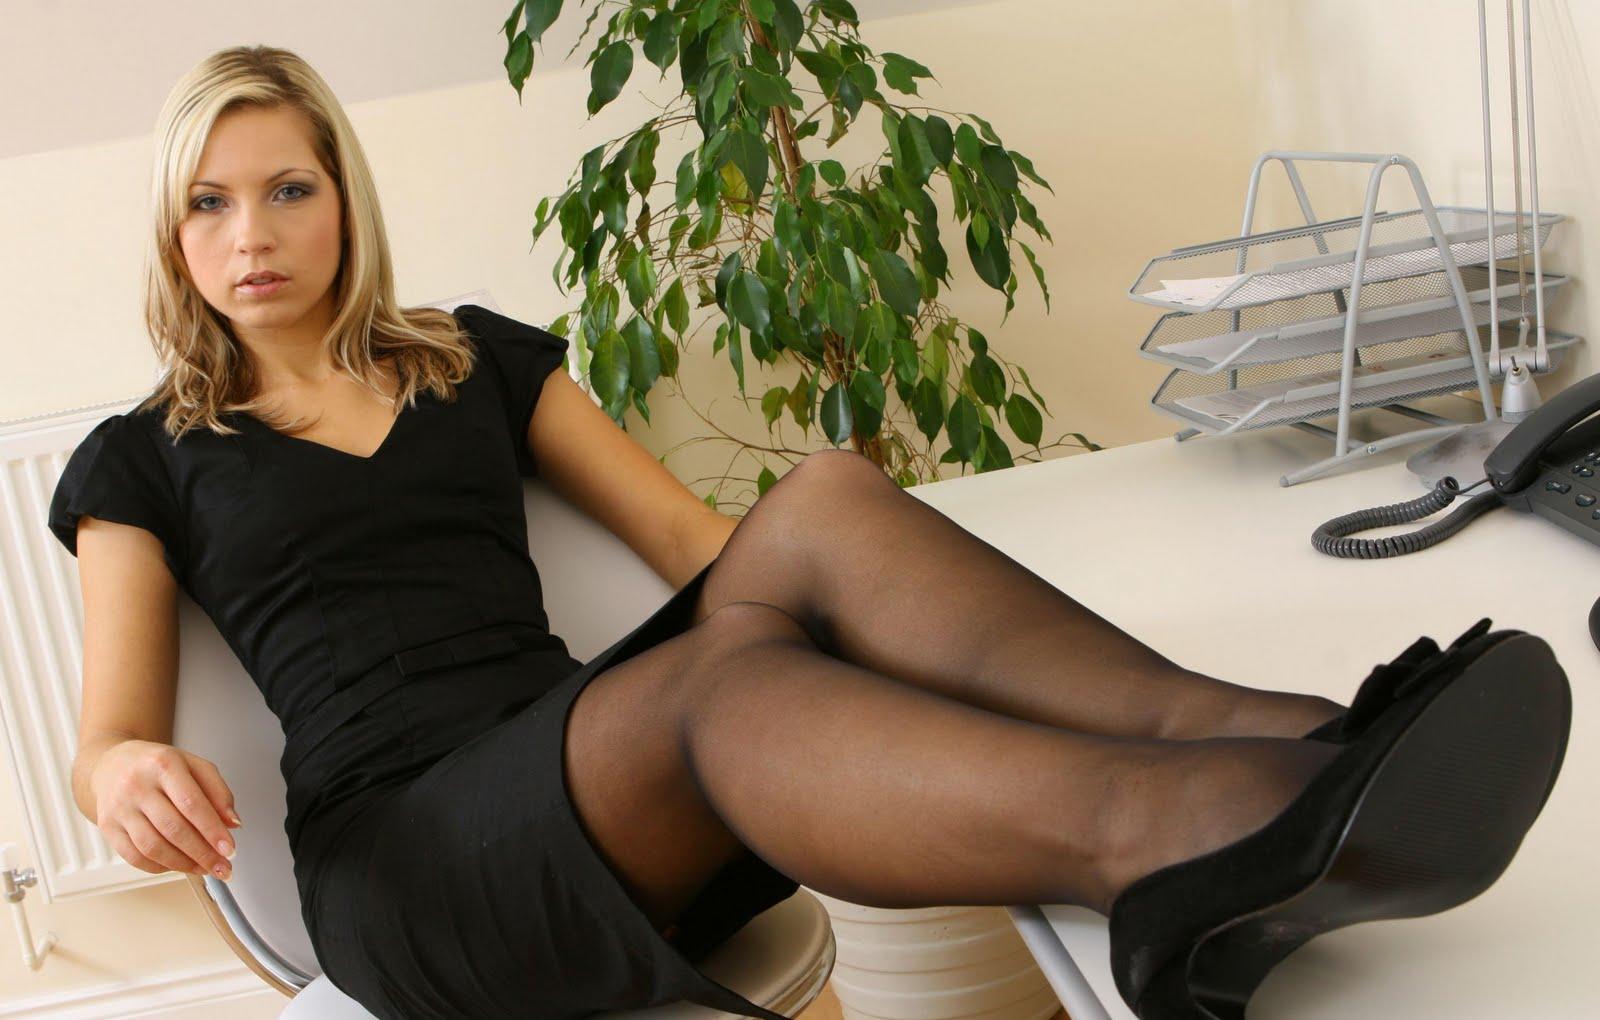 Jenni gregg black stockings sex images